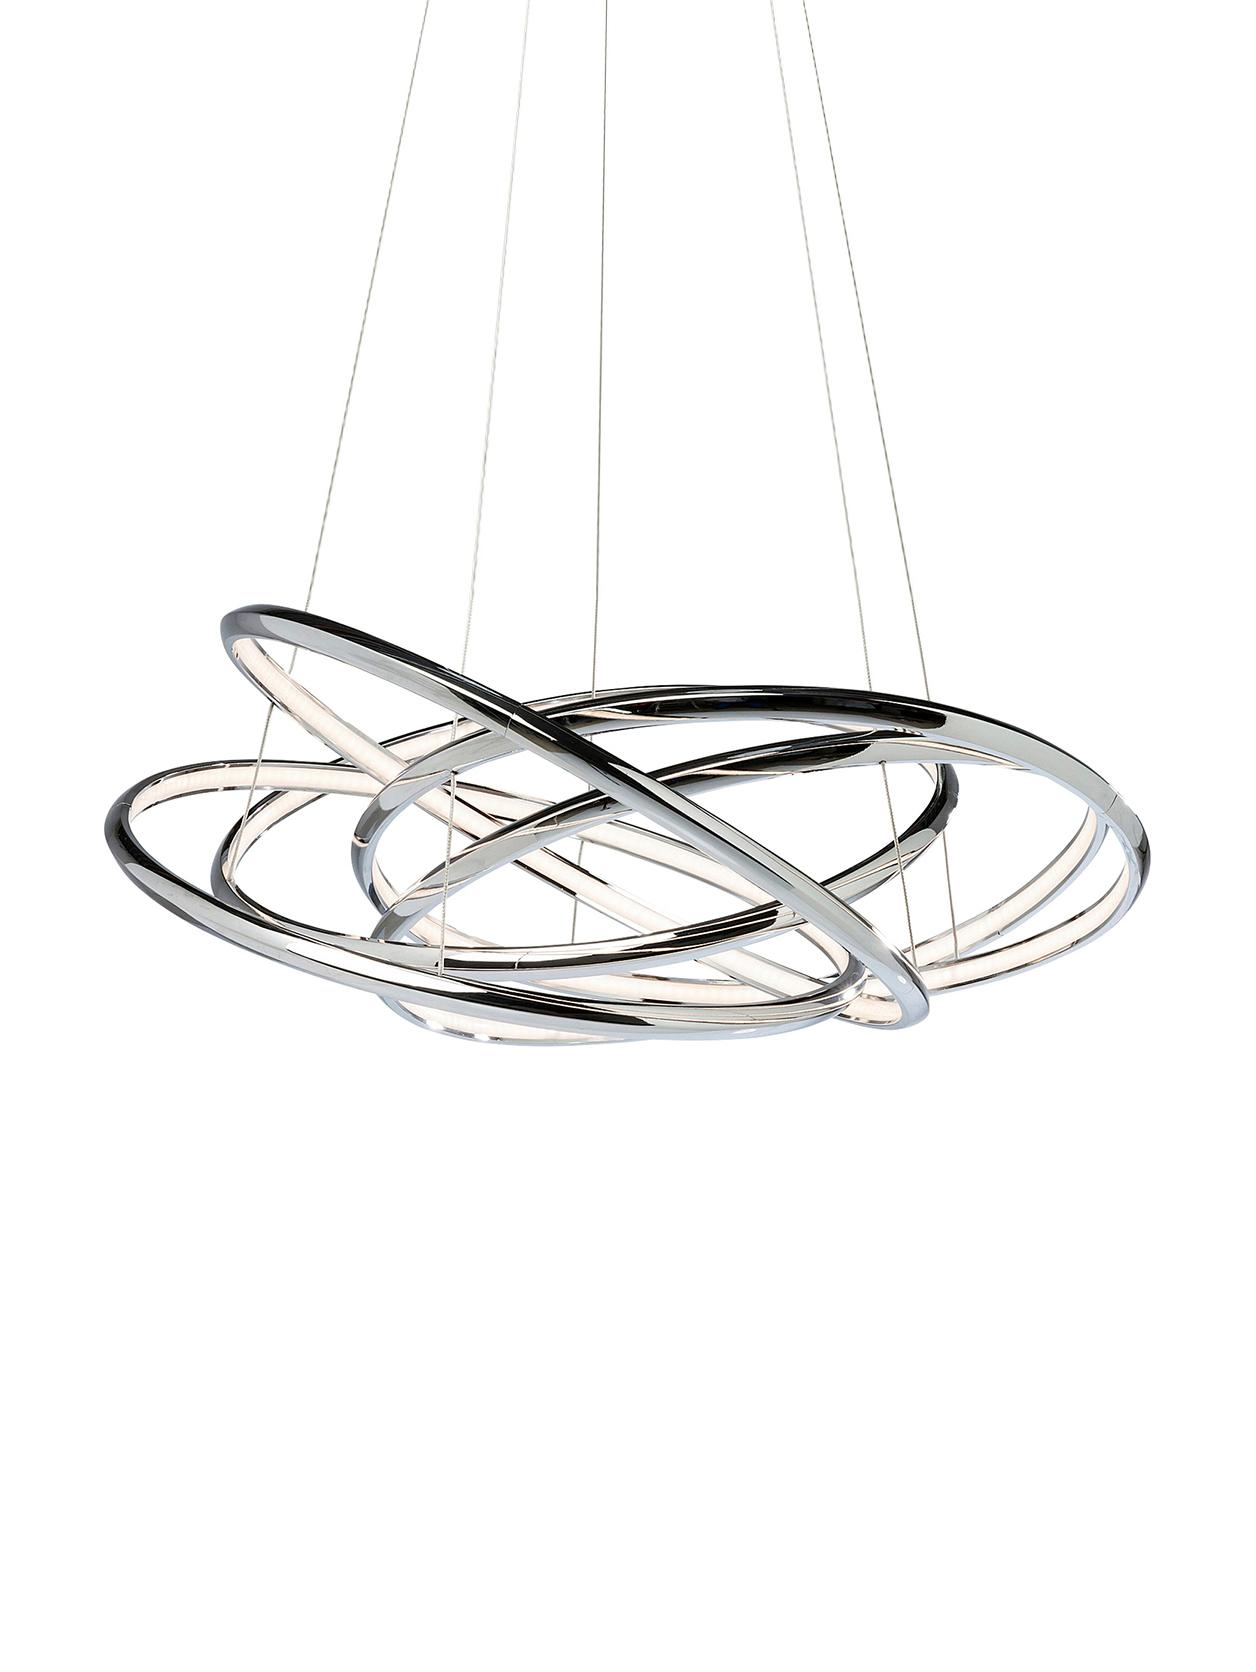 Moderne LED Pendelleuchte Saturn, Lampenschirm: Aluminium, verchromt, Baldachin: Stahl, vermessingt, Silberfarben, 75 x 120 cm